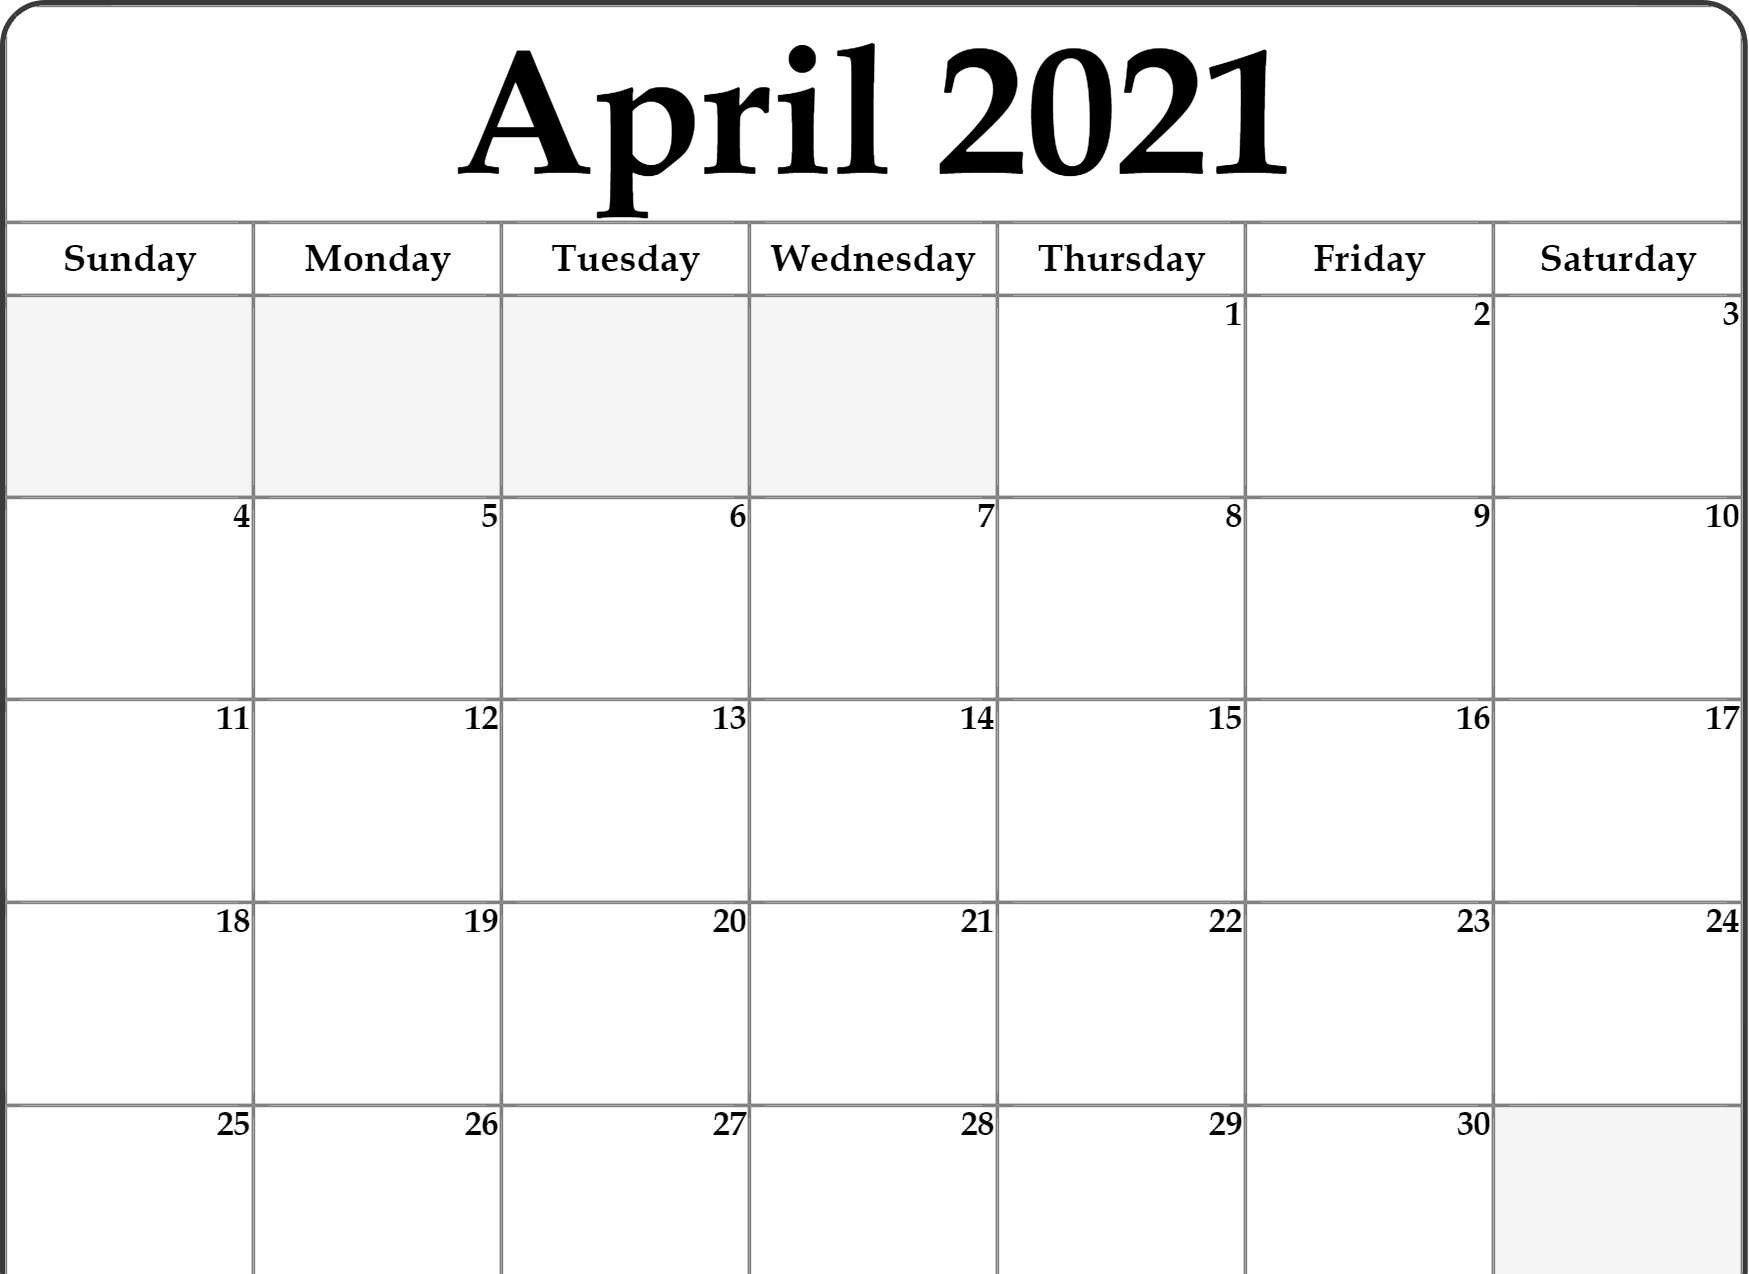 April 2021 Calendar Printable Template in PDF Word Excel